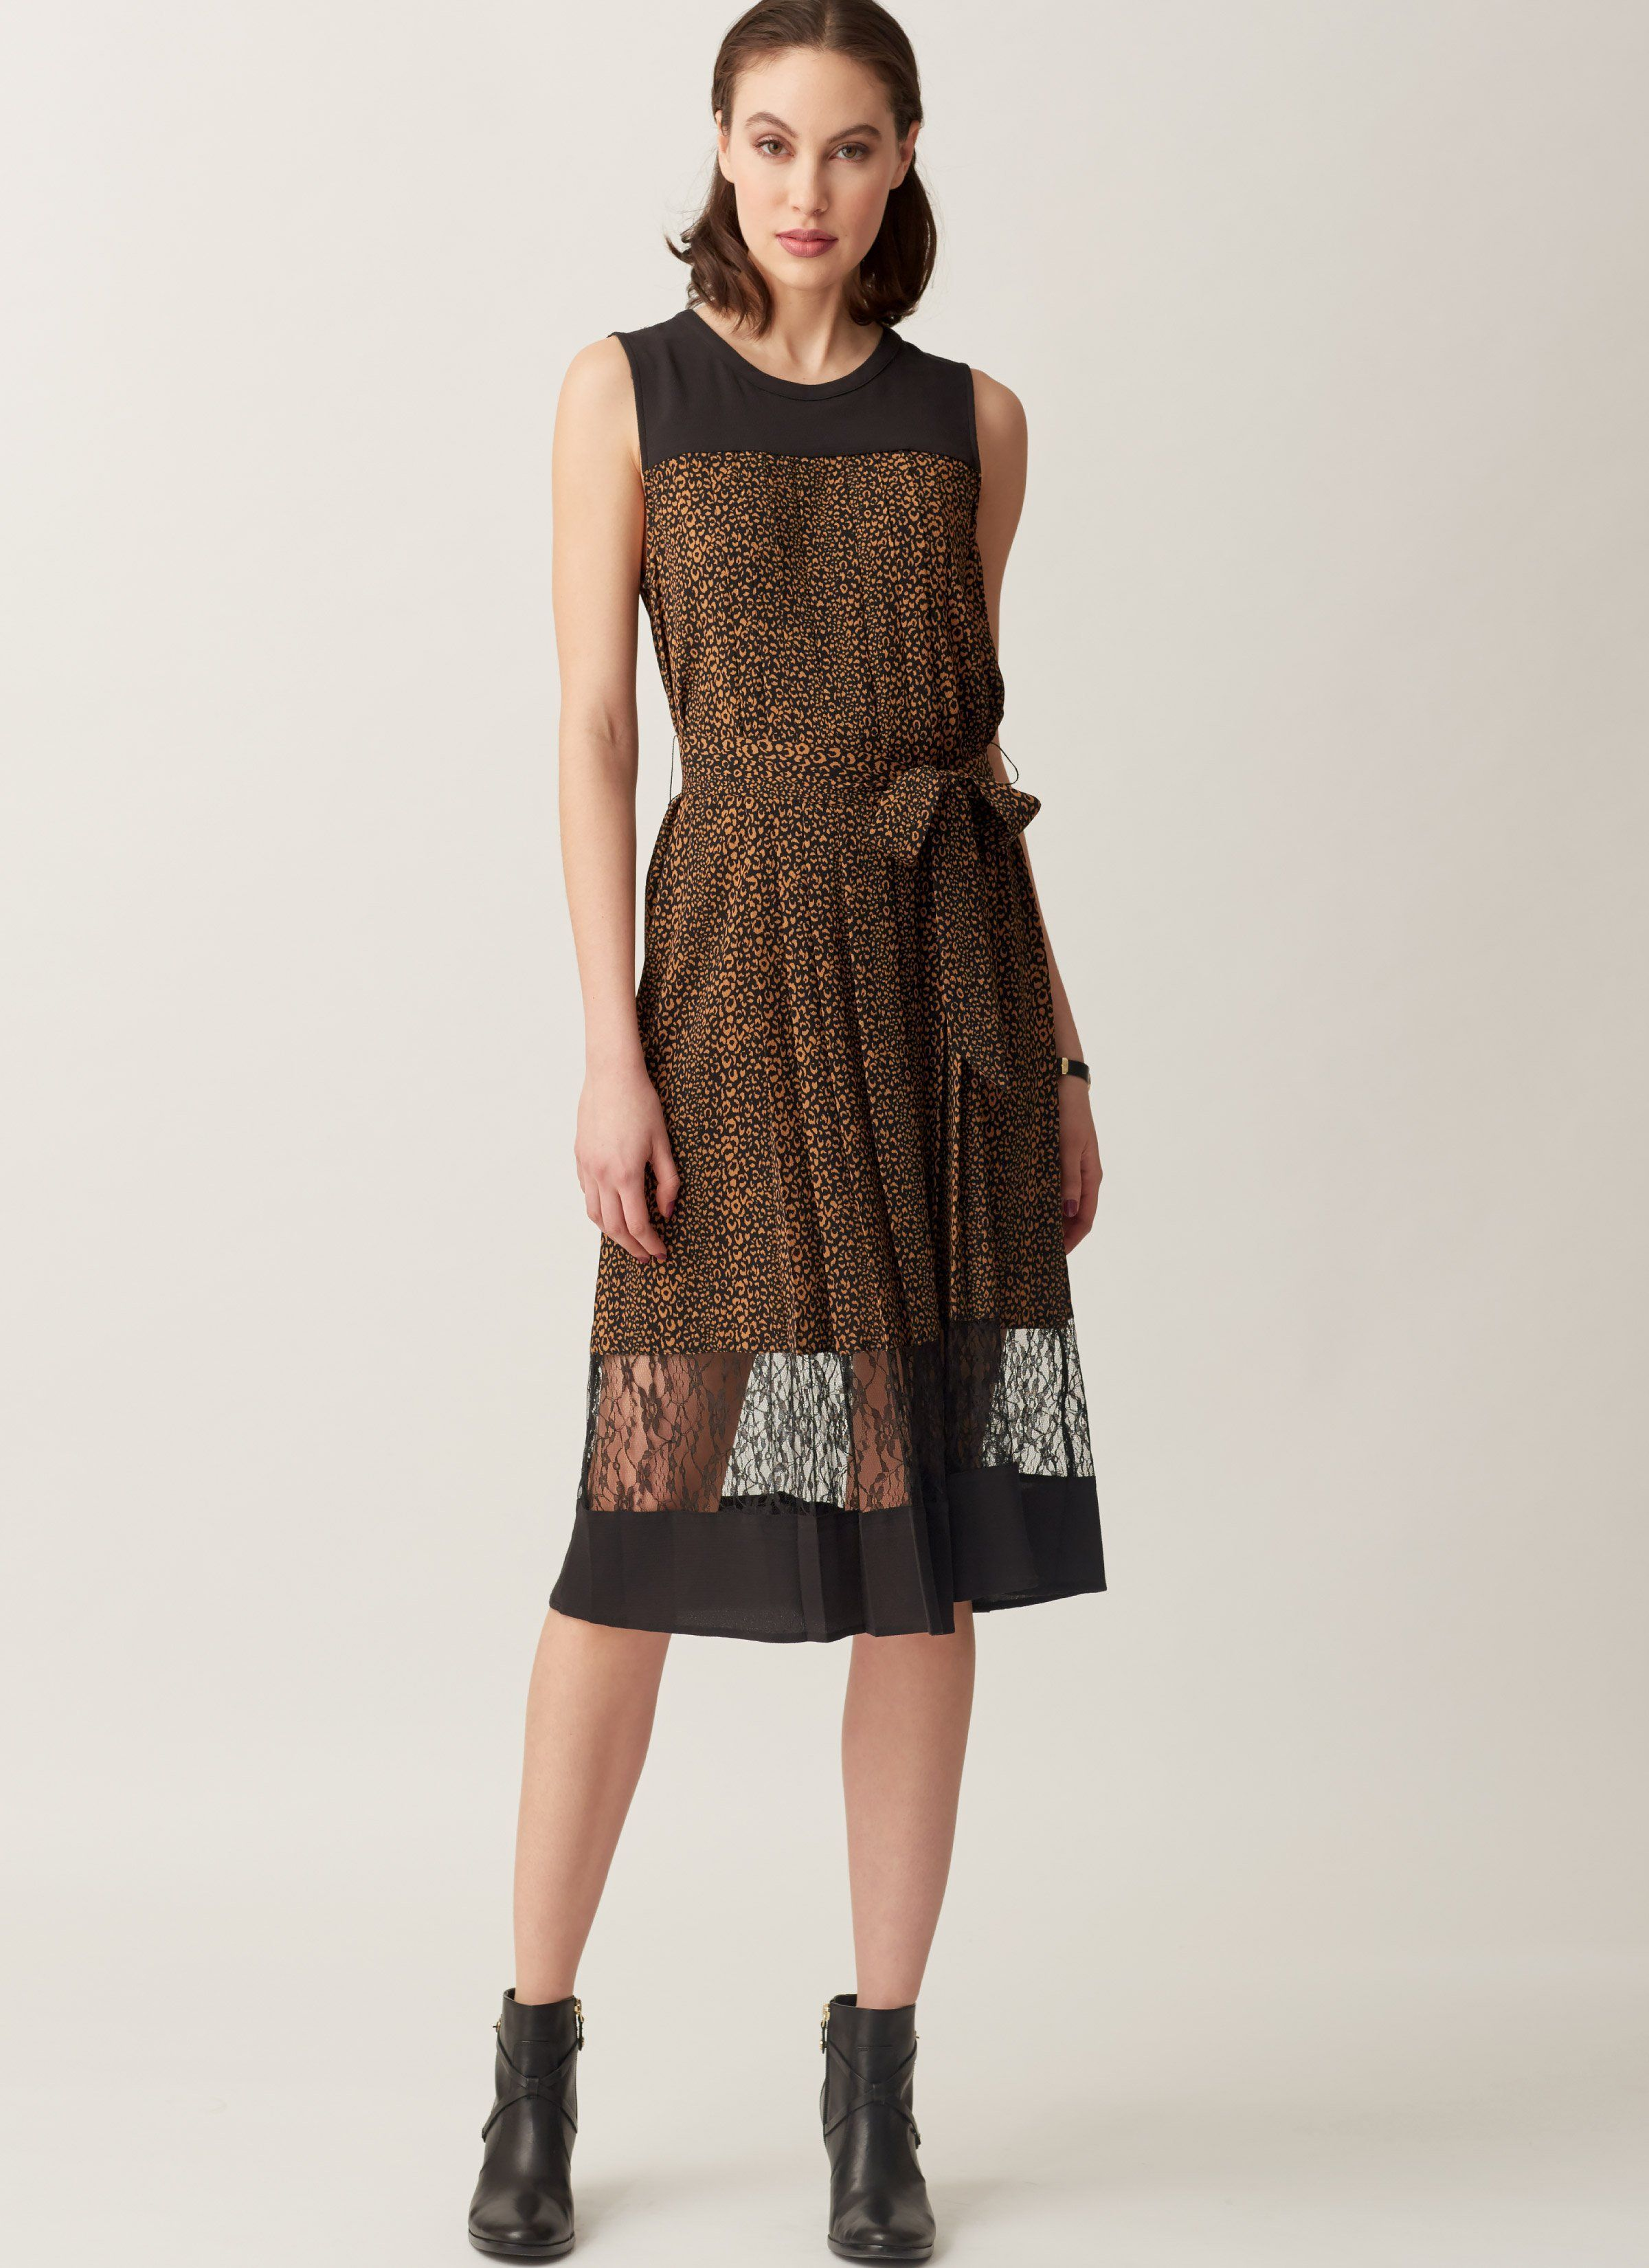 V1554 pleated sleeveless dress isaac mizrahi jaycotts v1554 pleated sleeveless dress isaac mizrahi jaycotts sewing jeuxipadfo Choice Image